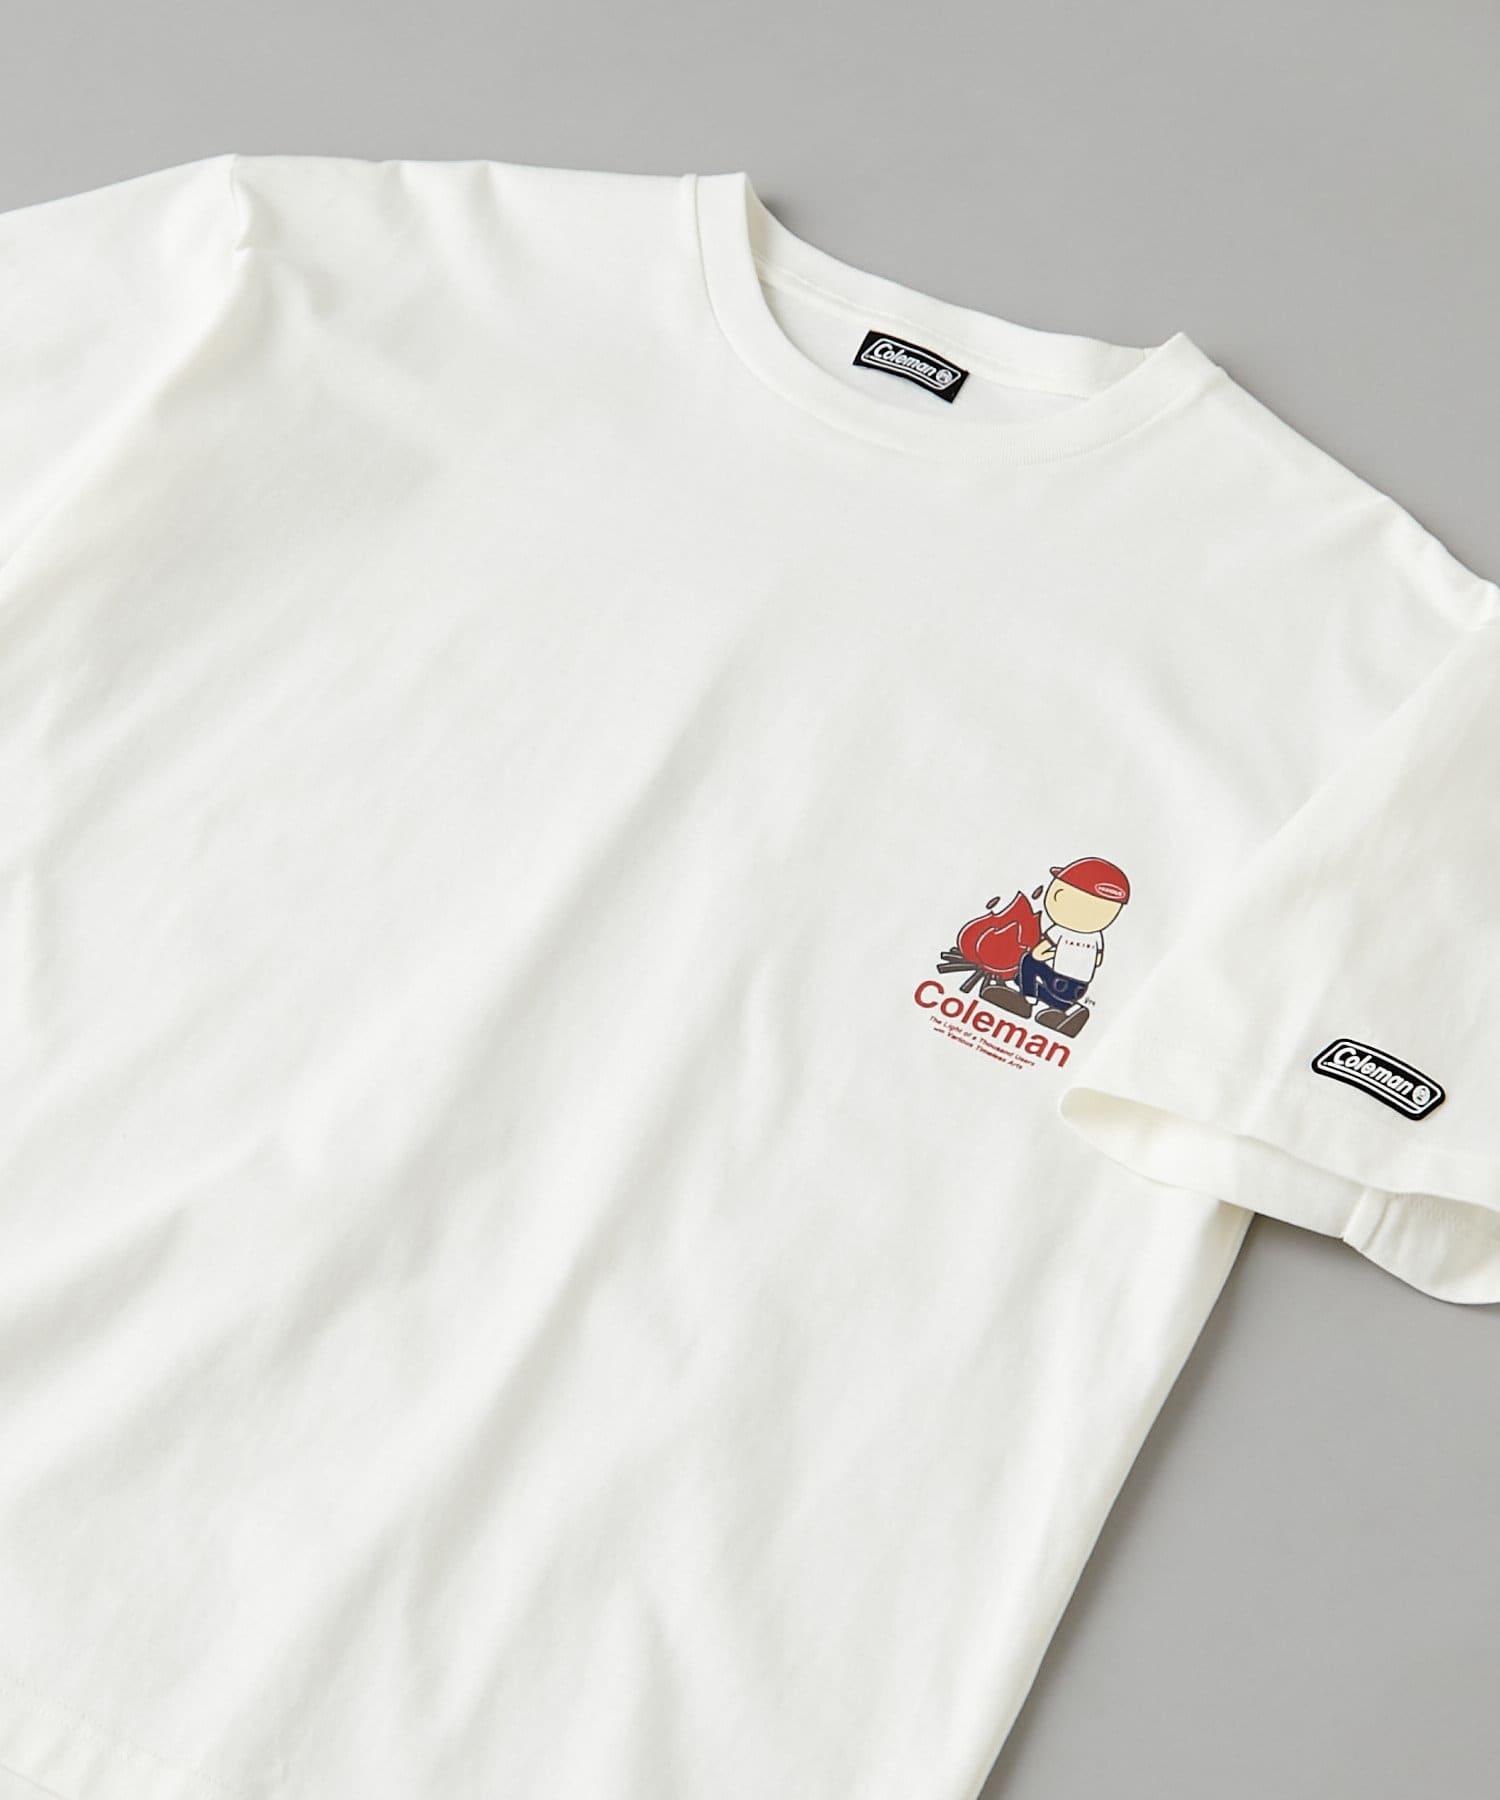 CIAOPANIC(チャオパニック) 【Coleman×CIAOPANIC】TAKIBI MAN プリントTシャツ